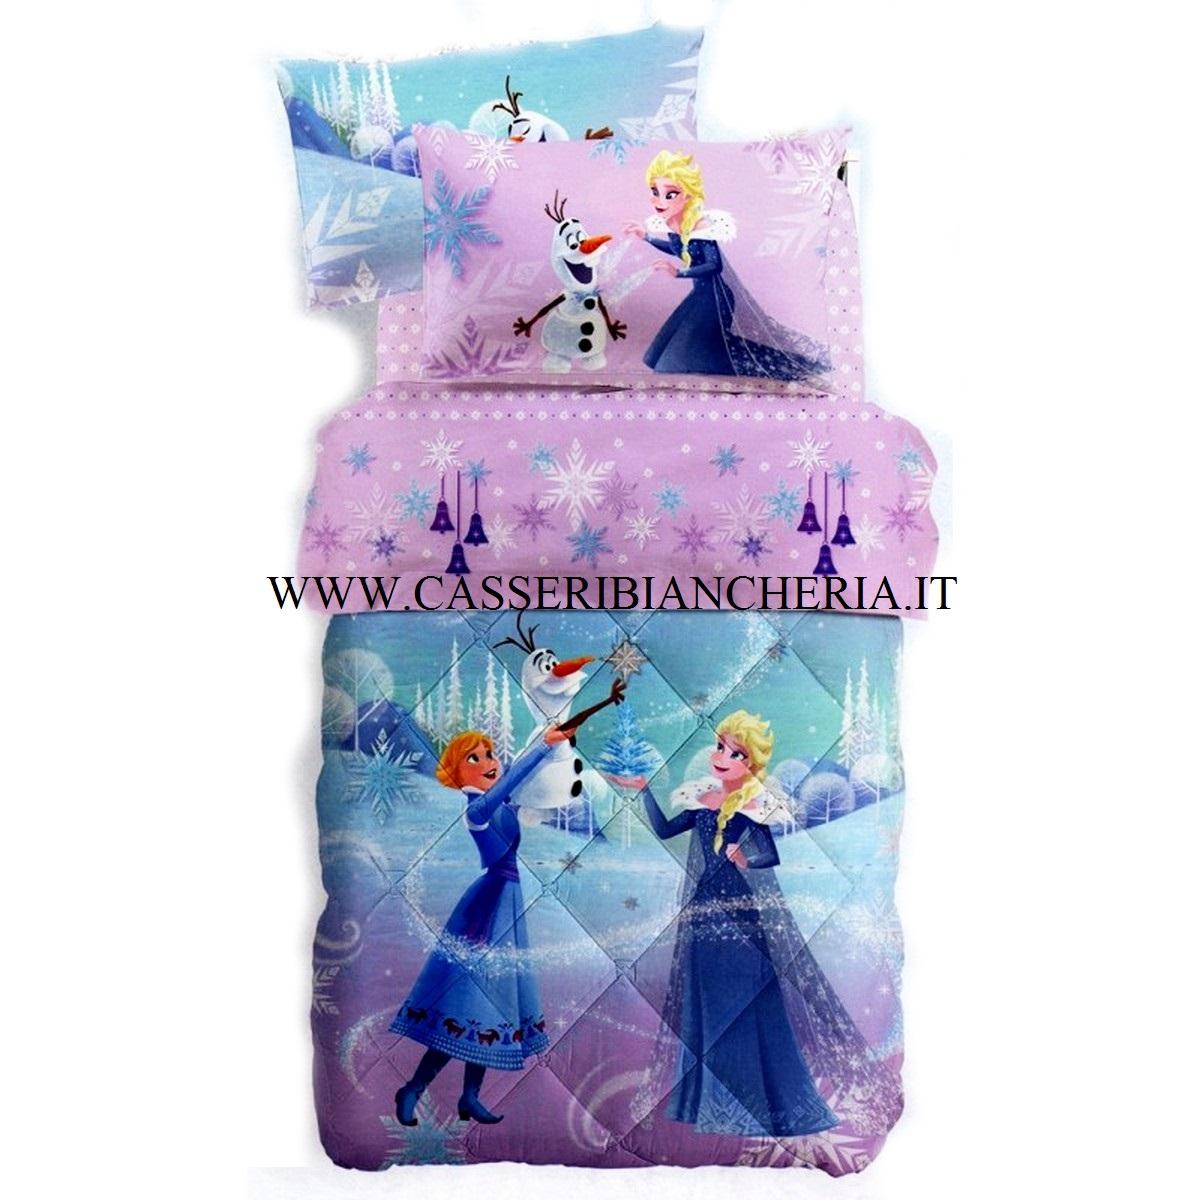 Piumone Principesse Disney Caleffi.Frozen Fiocco Di Neve Trapunta Singola Con Stampa Glitter Caleffi